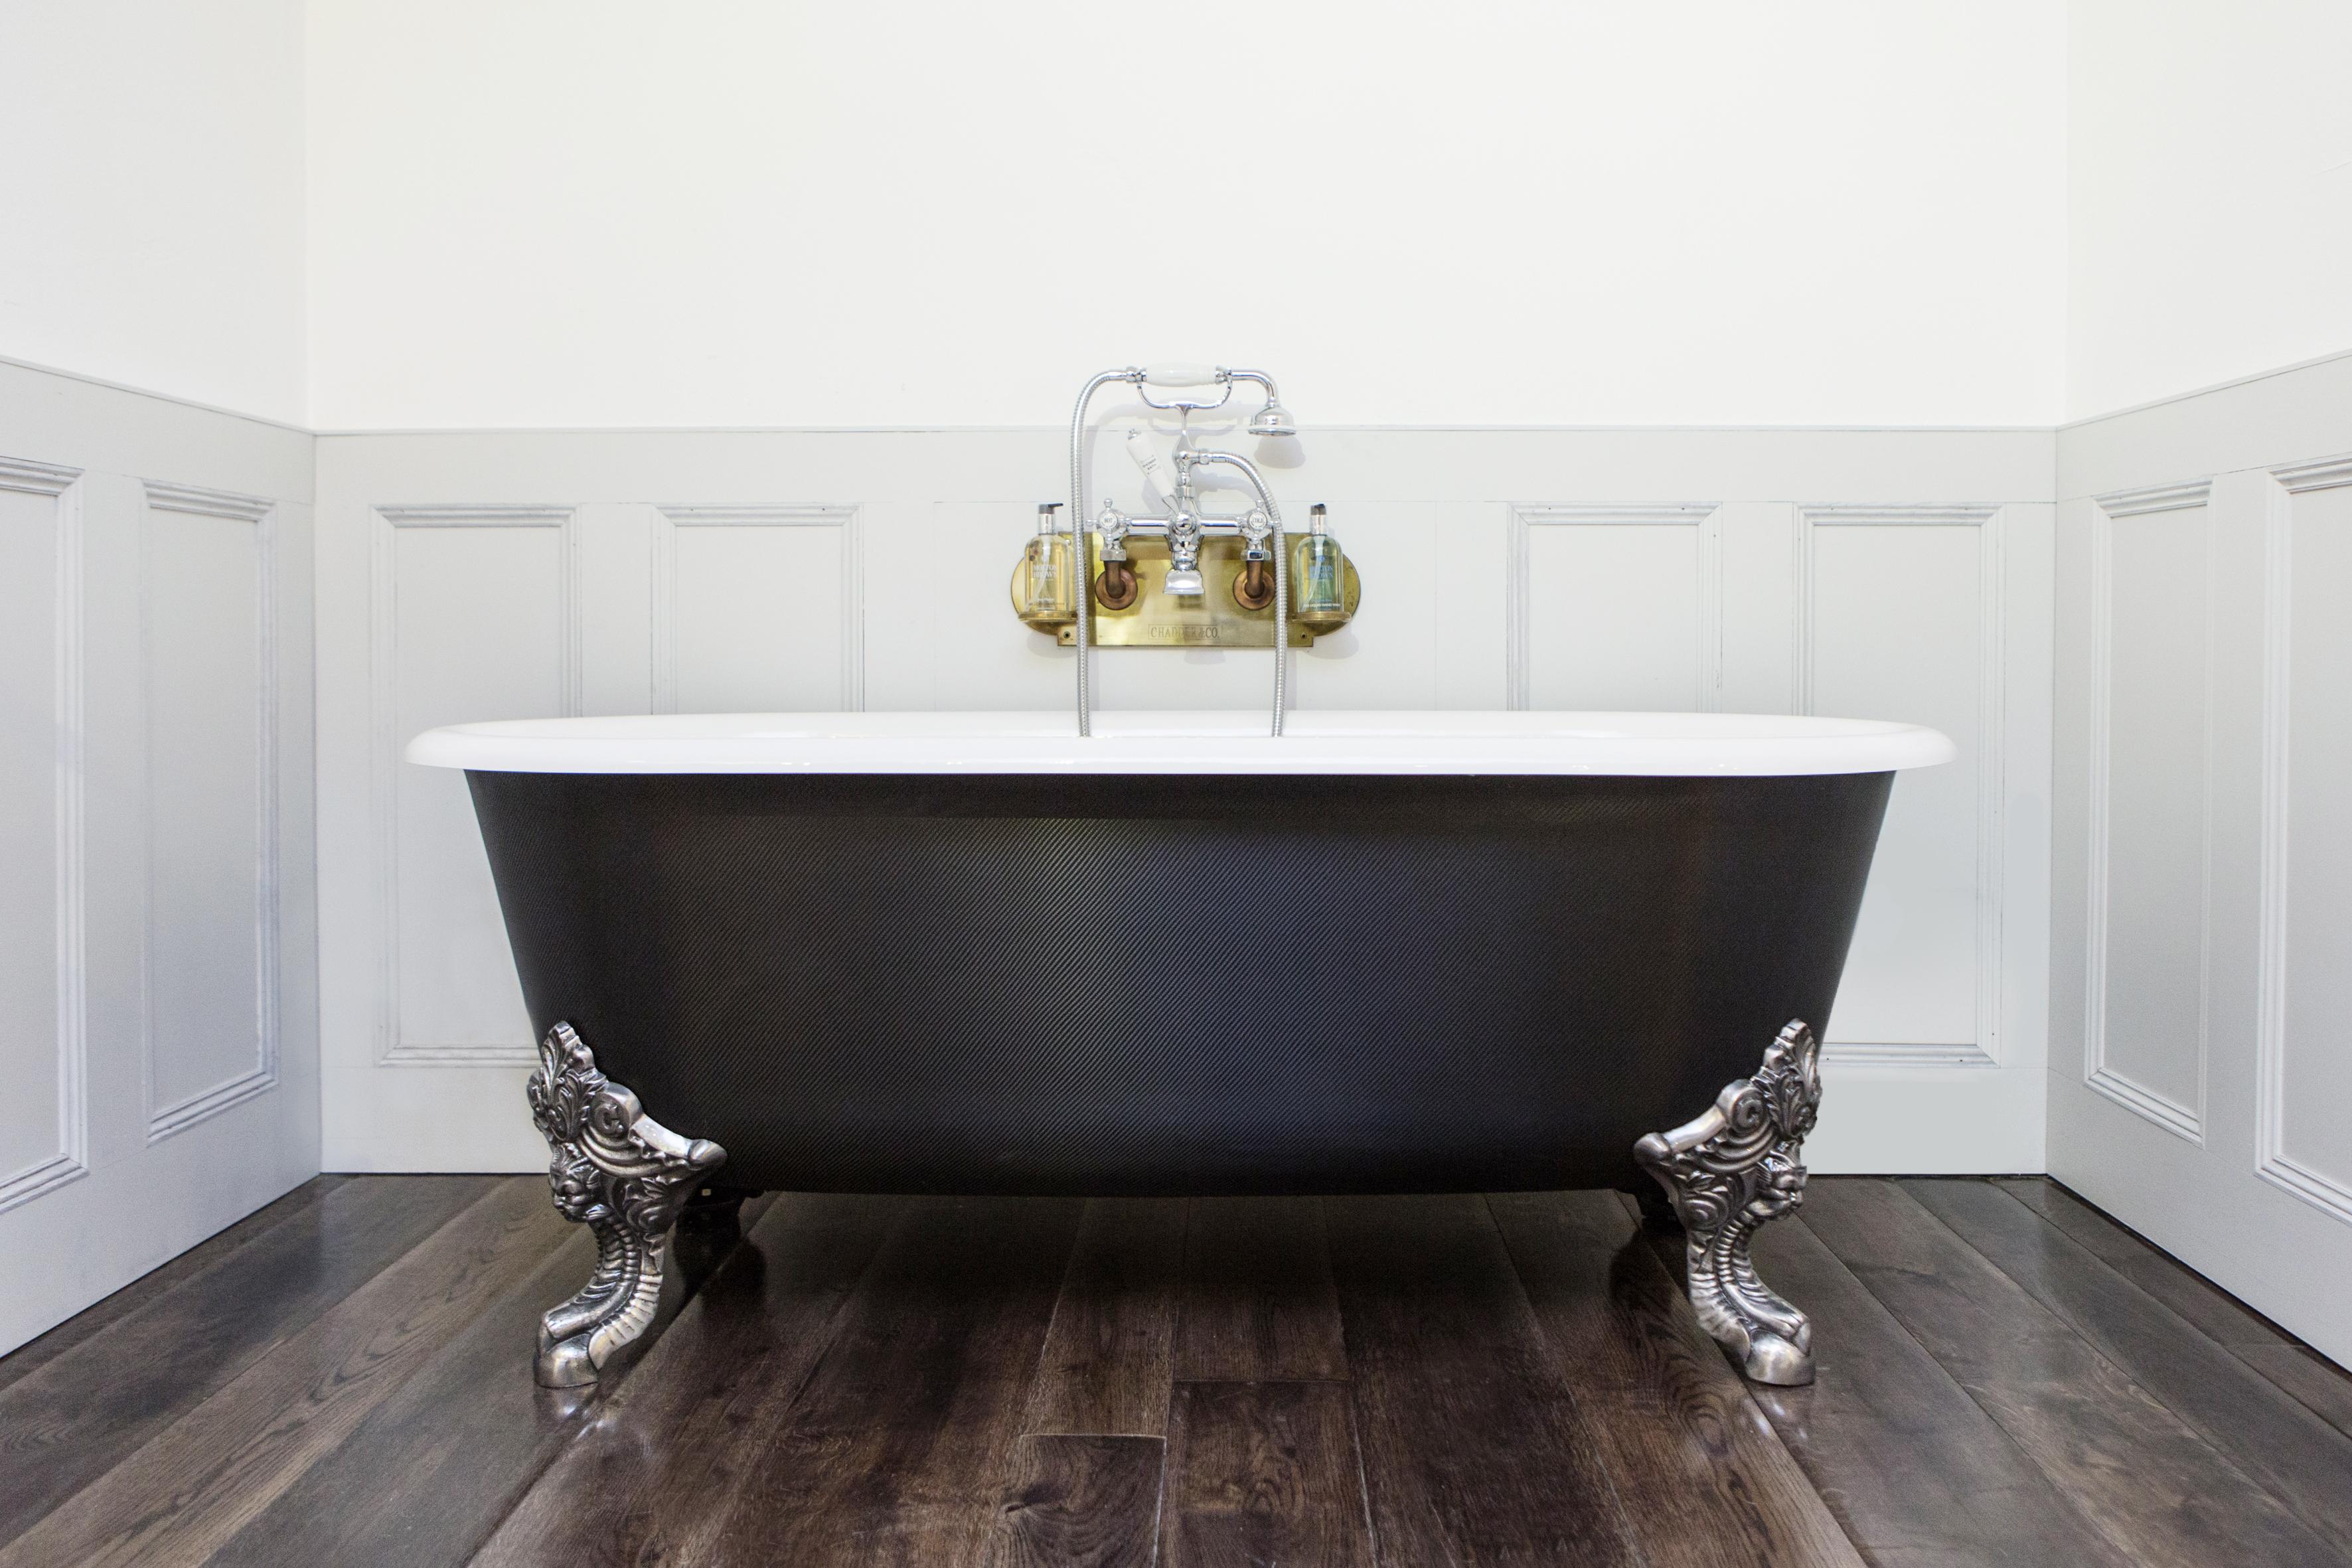 Blenheim Bath Wrapped in Carbon Fibre design